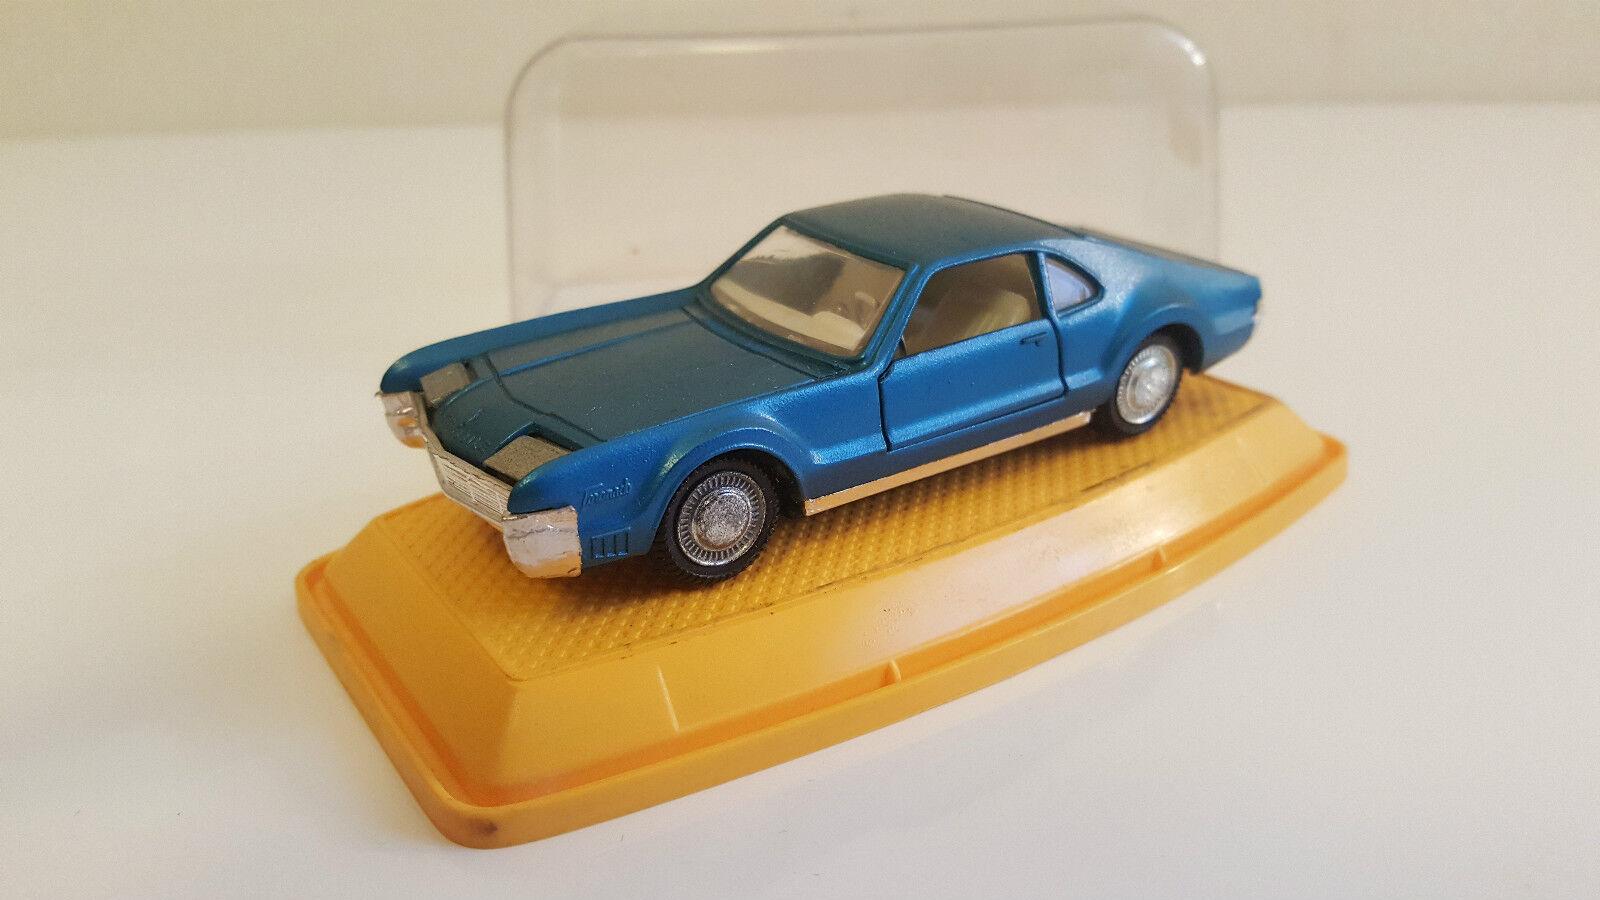 Pilen-m-307 - oldsmobile tgoldnado in original box (1 43)